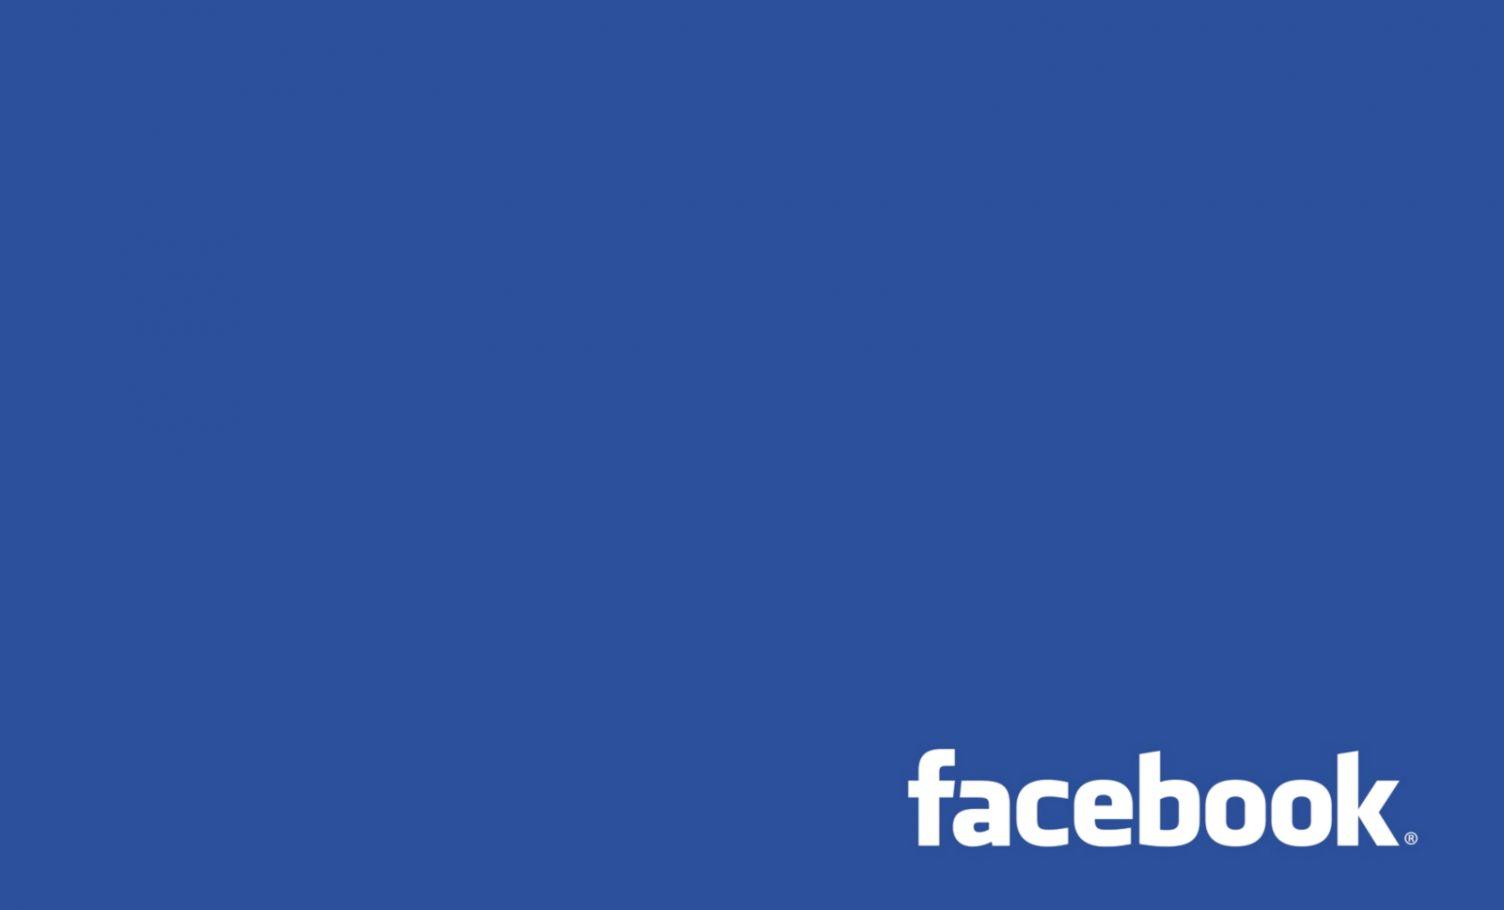 Facebook Desktop Wallpaper Eazy Wallpapers